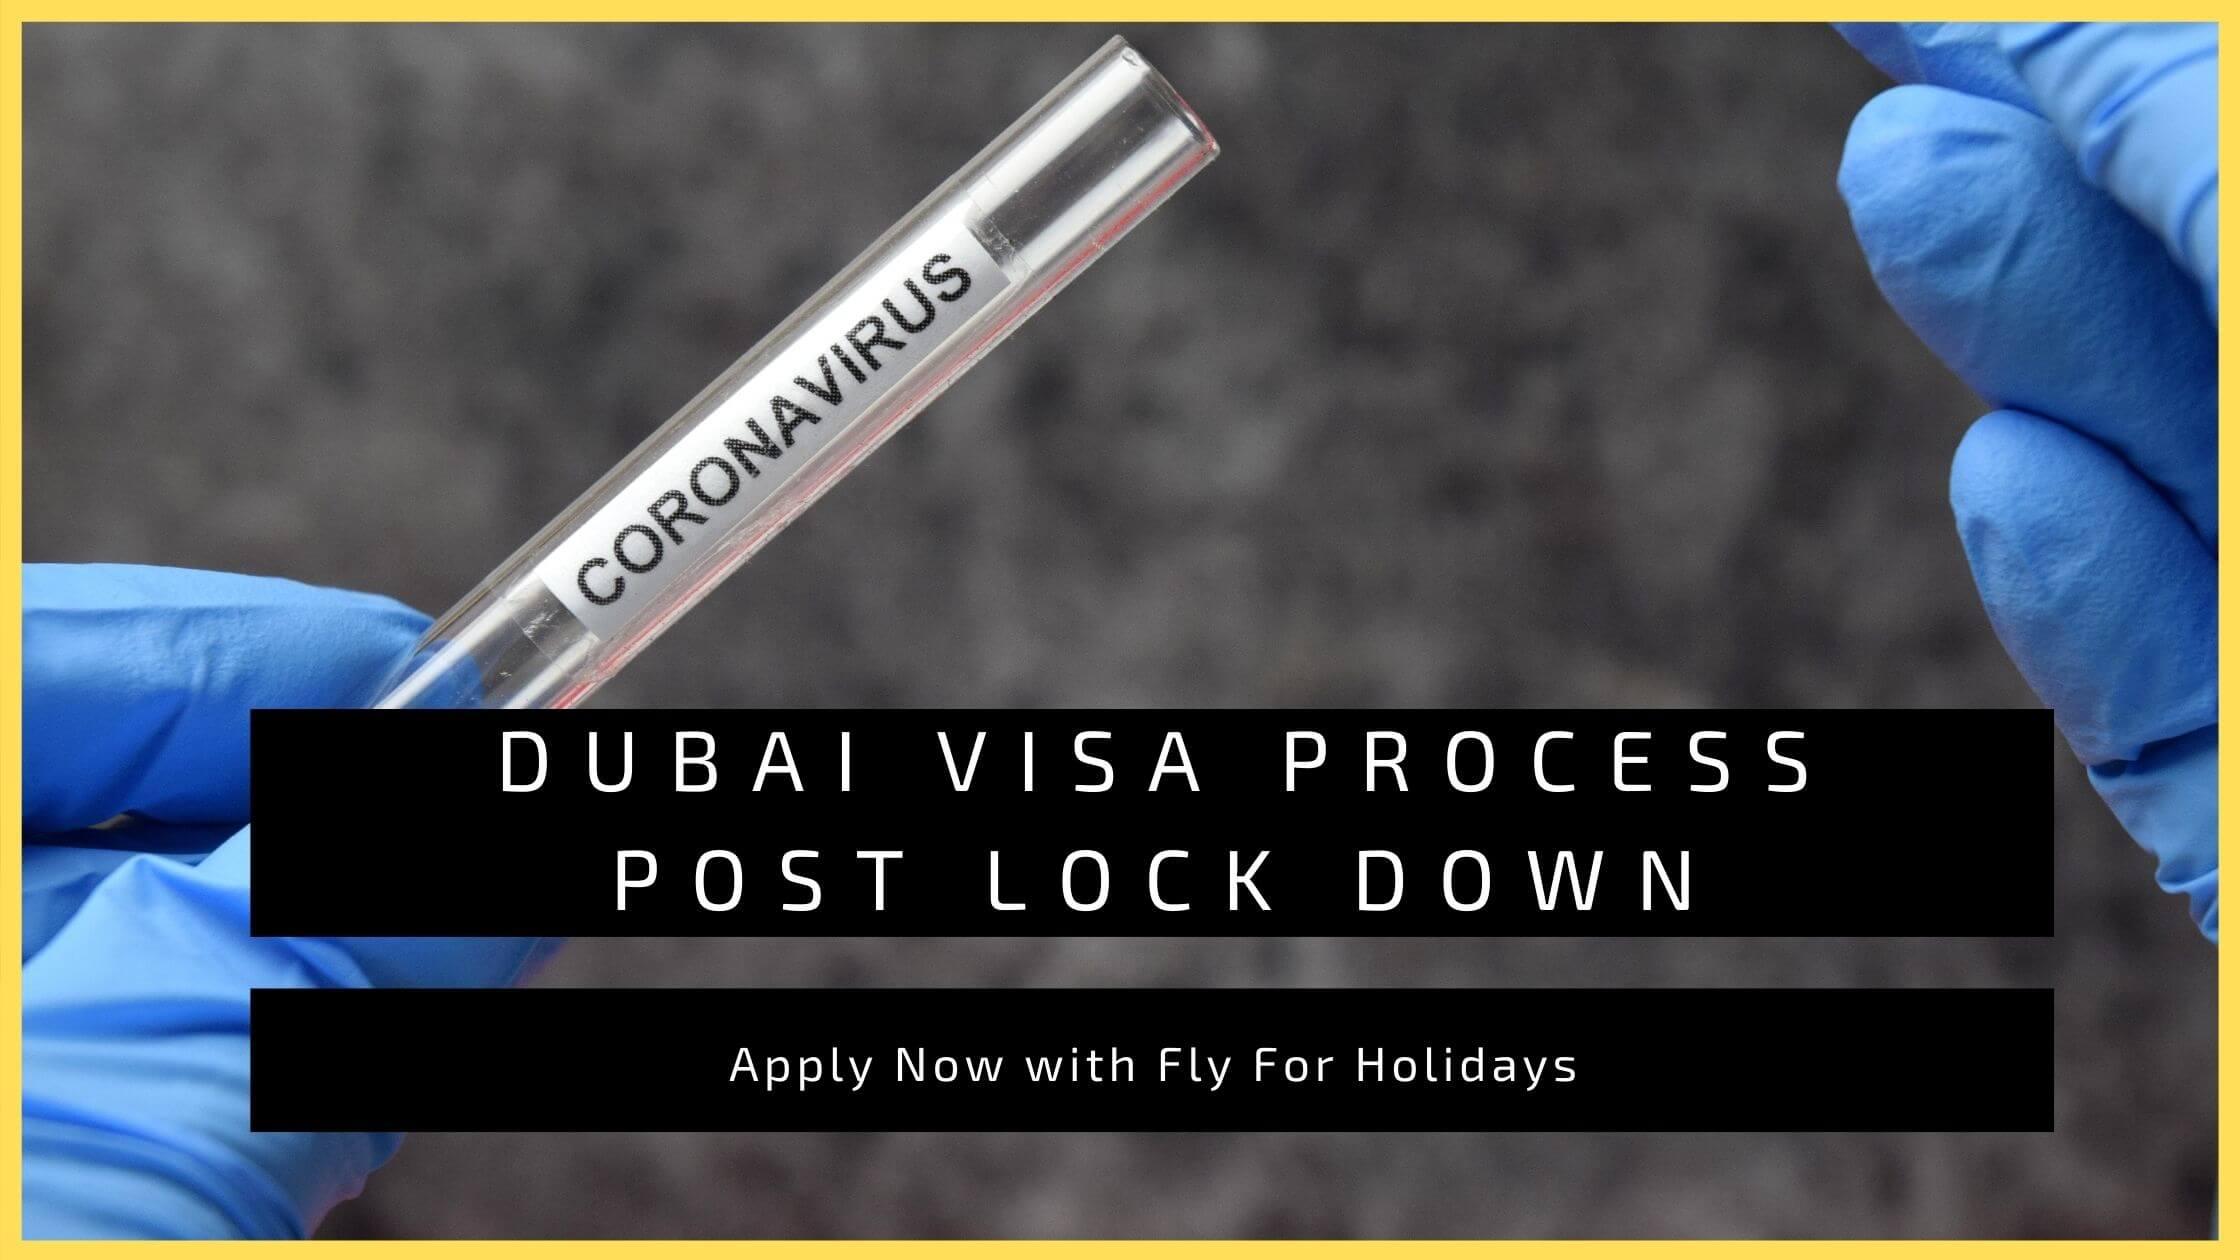 Steps to get Dubai Visa post lockdown - Fly For Holidays